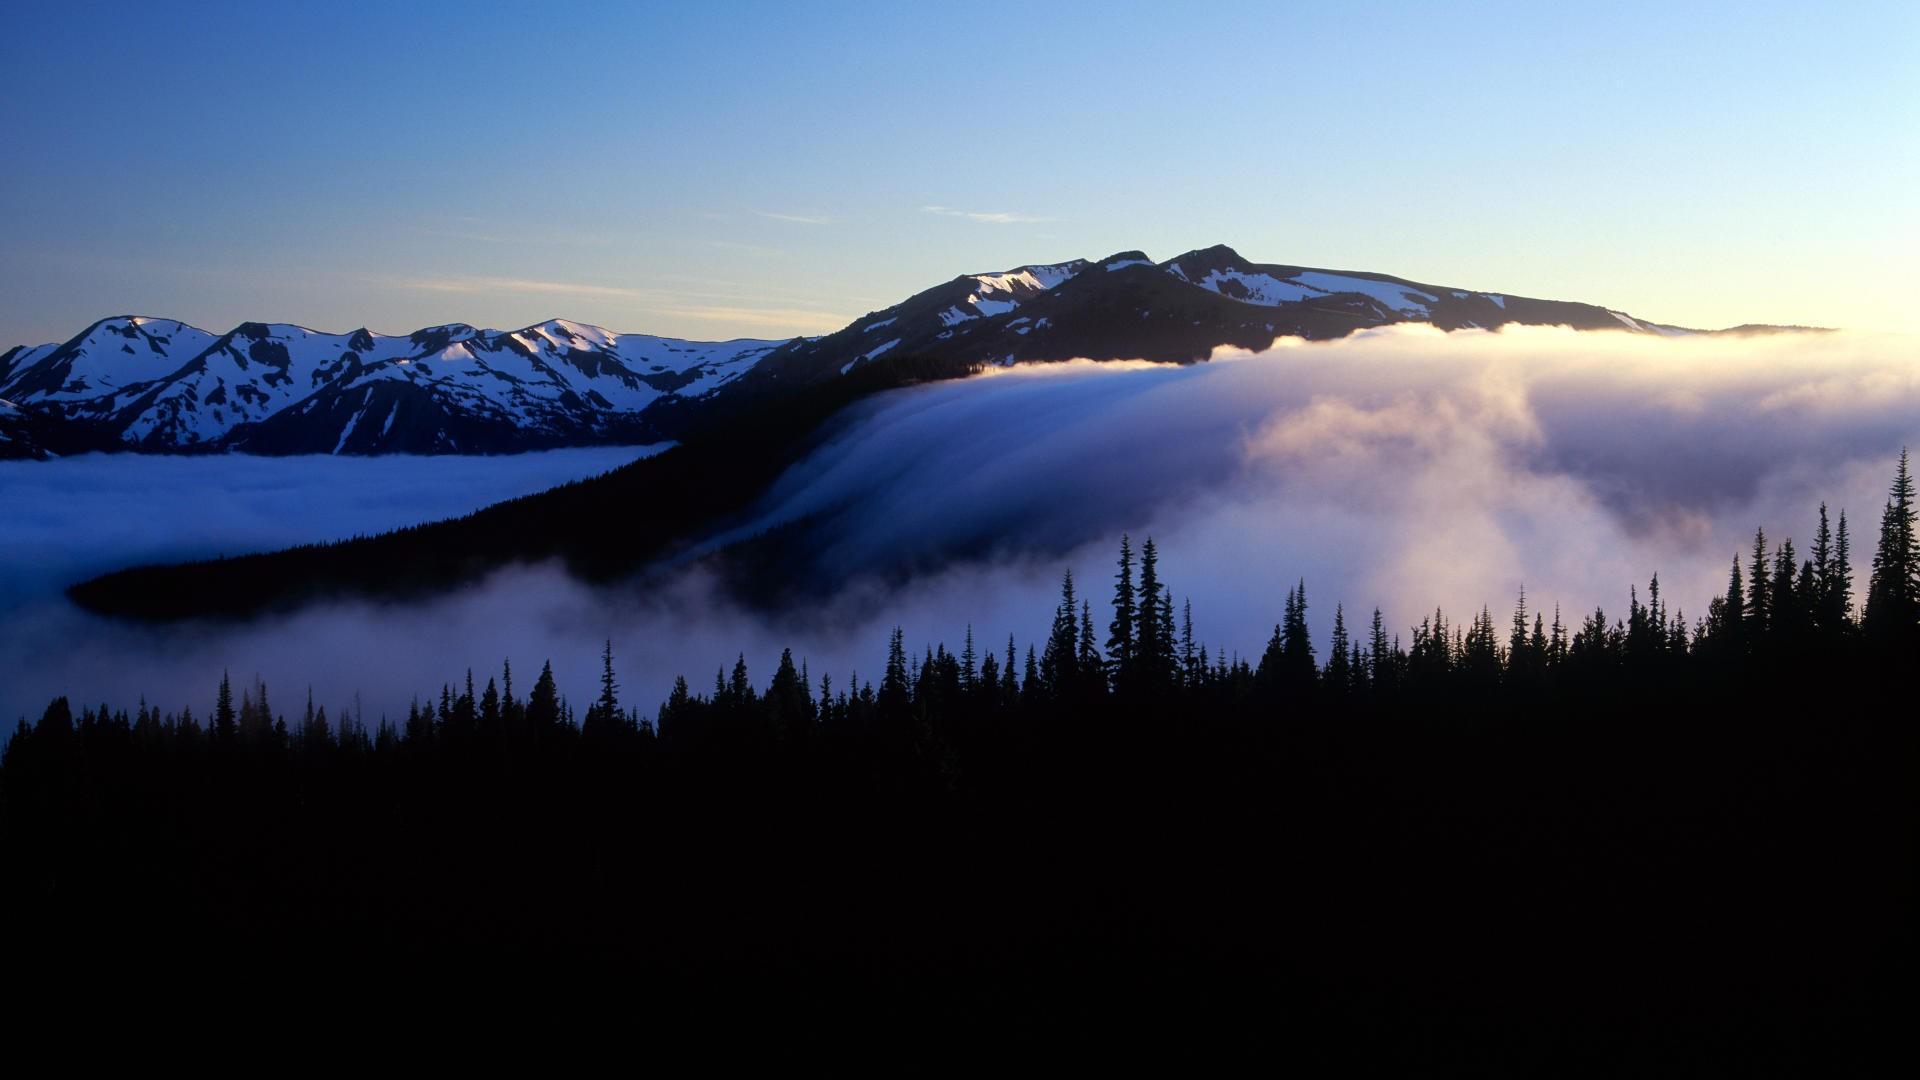 Fantastic Yukon Wallpaper 37495 1920x1080 px